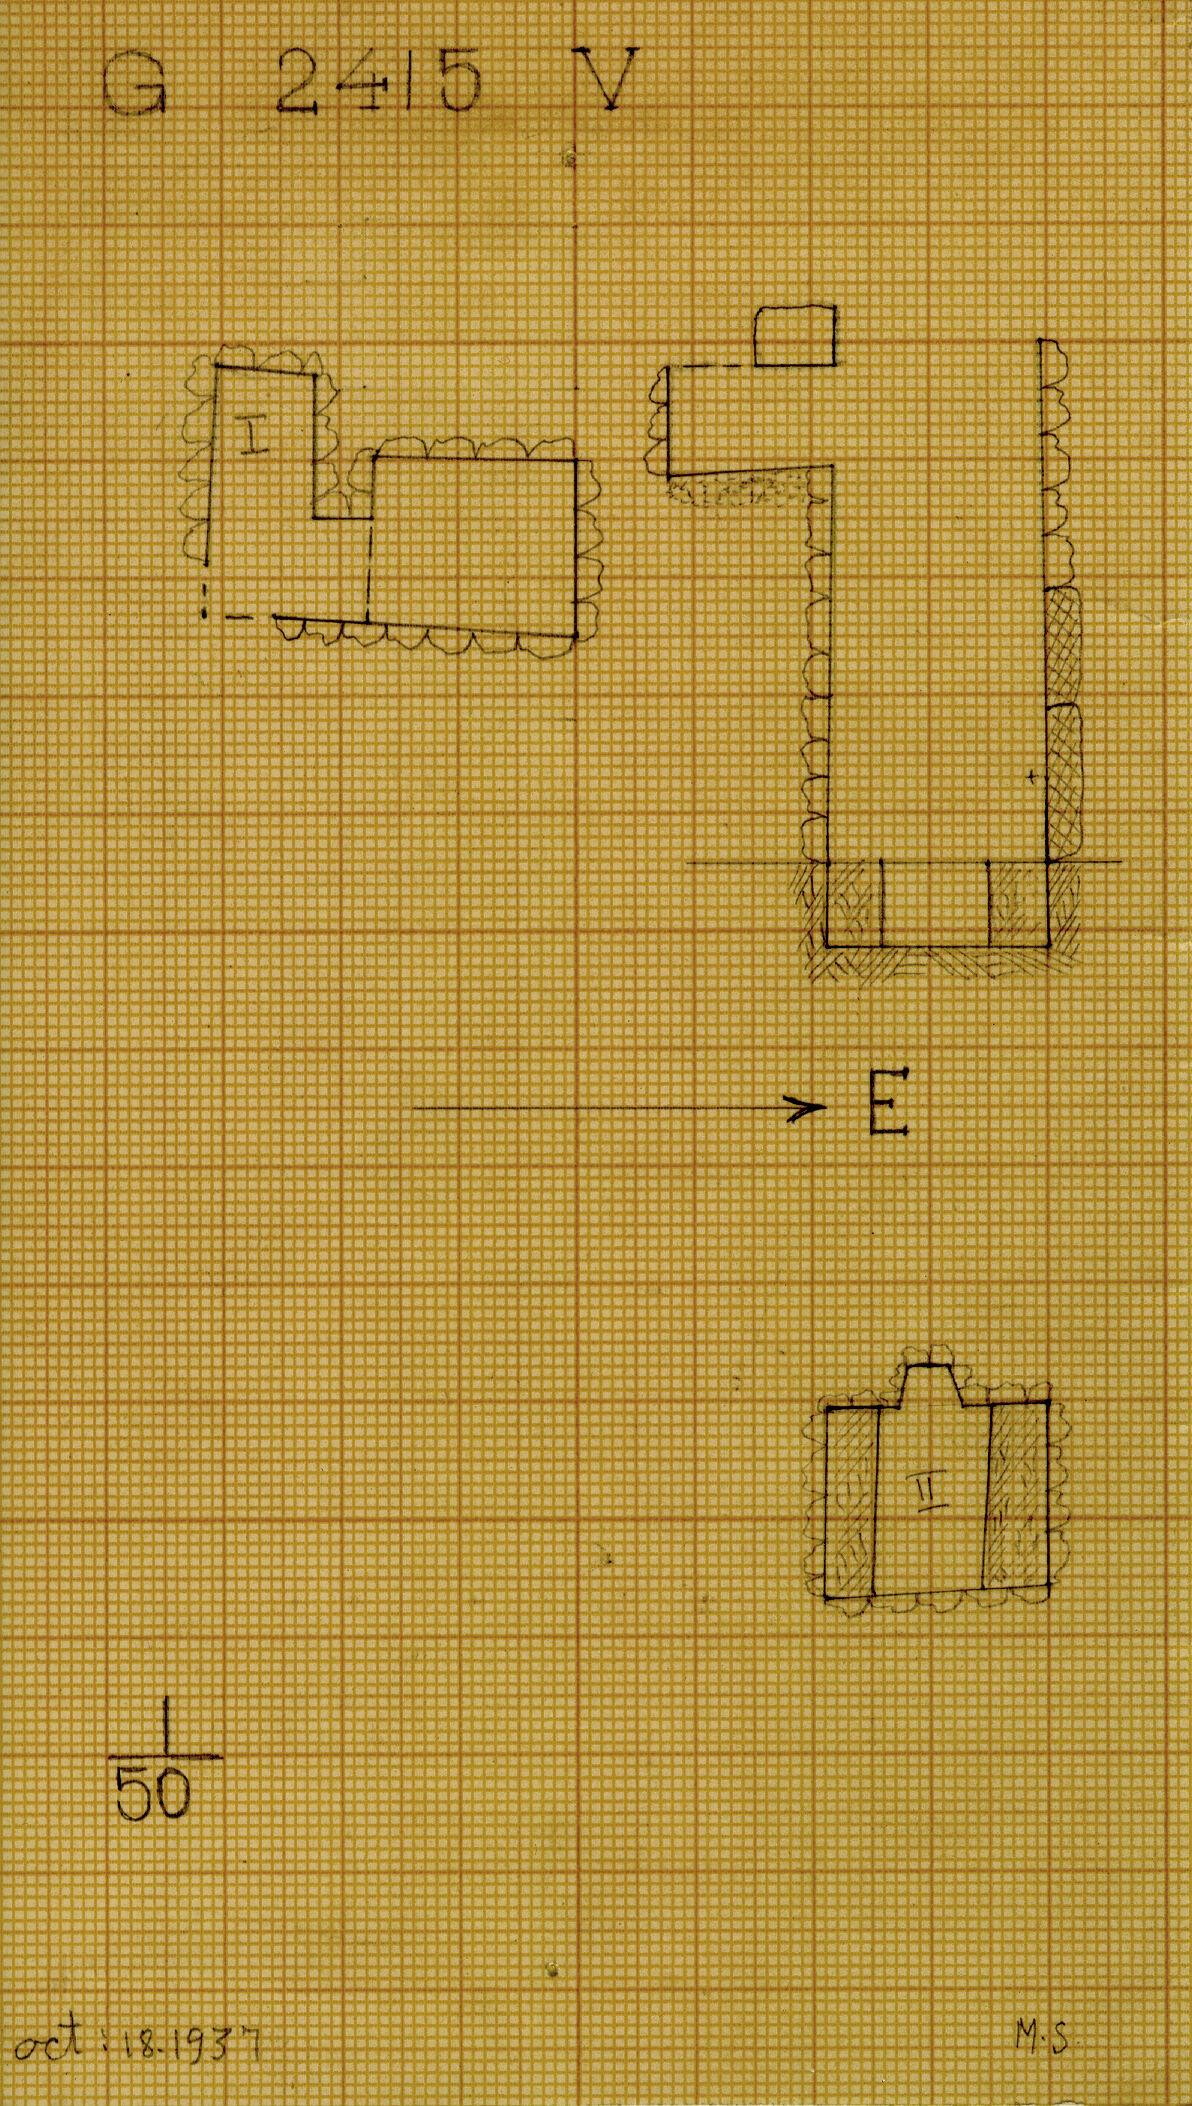 Maps and plans: G 2415, Shaft V